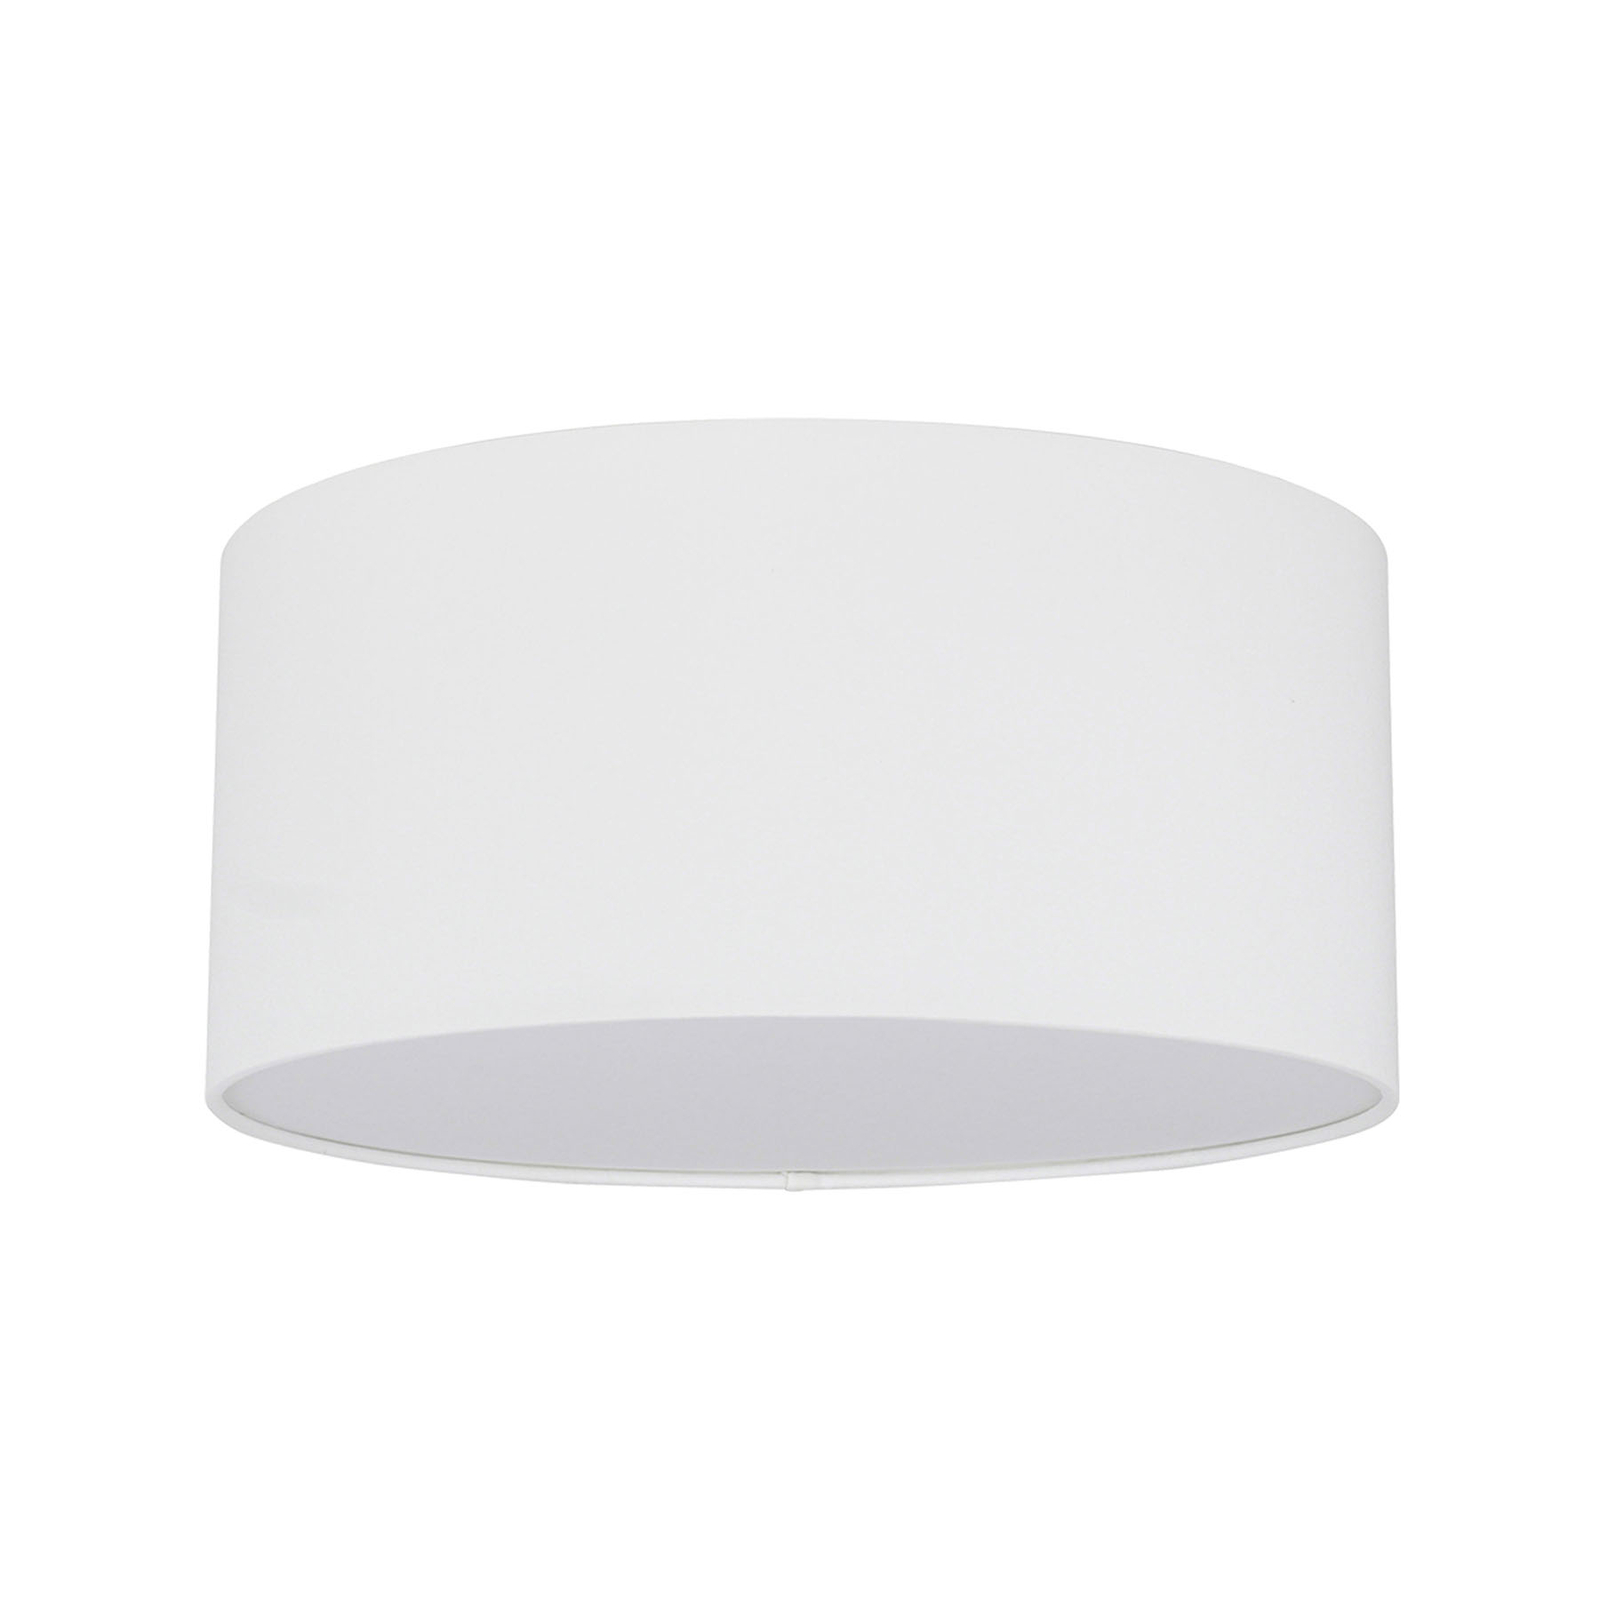 Lampa sufitowa LED Josefina, Ø 28 cm, biała